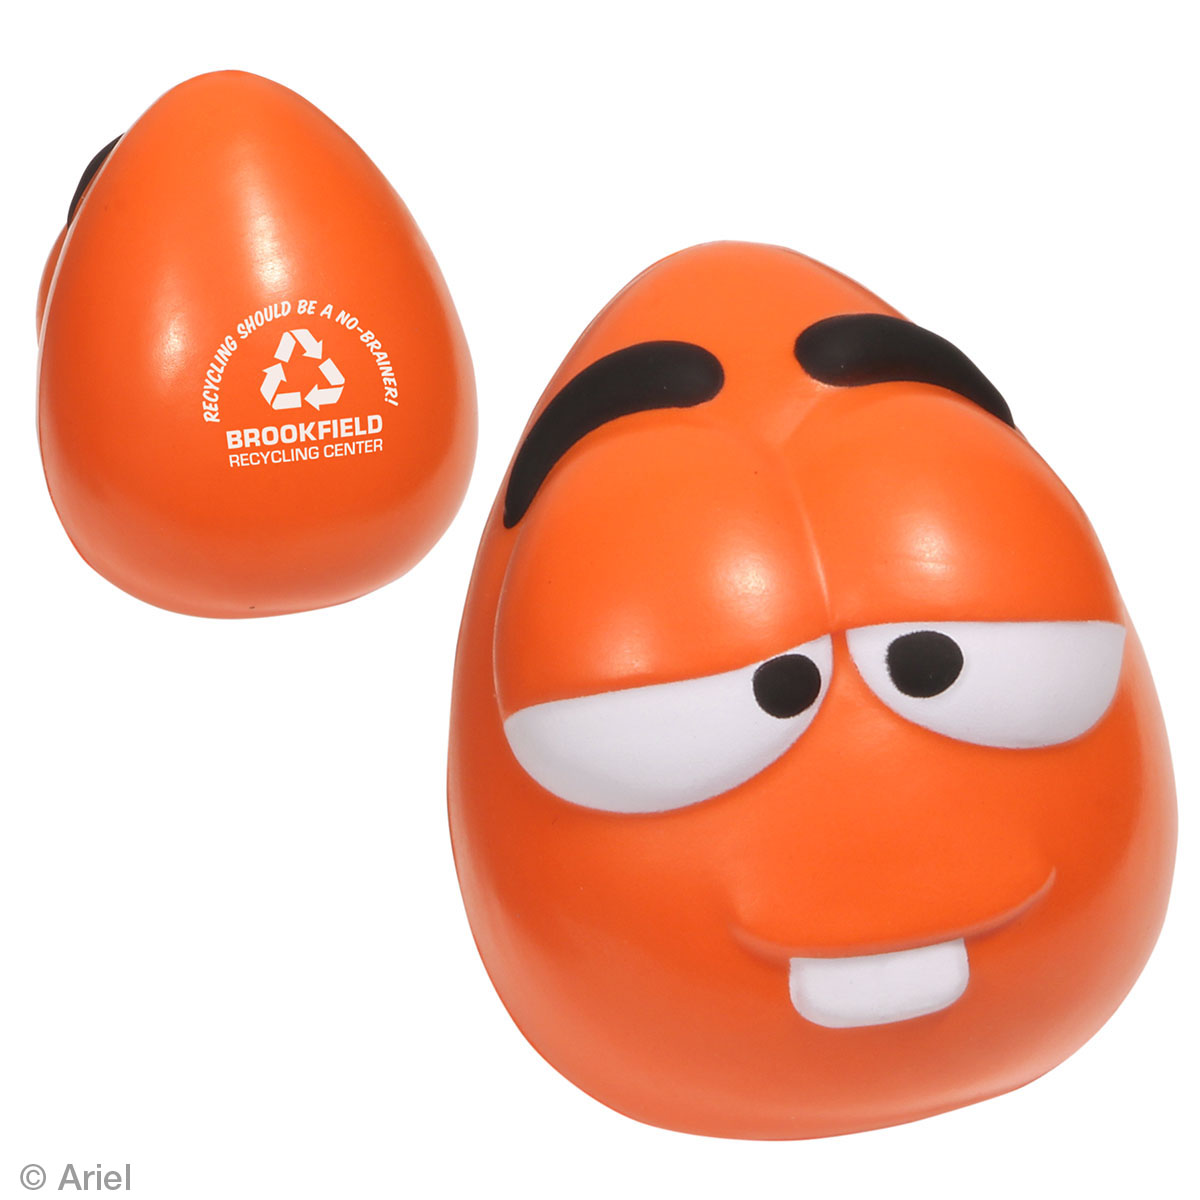 Wacky Mini Mood Maniac Stress Reliever, LGS-WA13 - 1 Colour Imprint